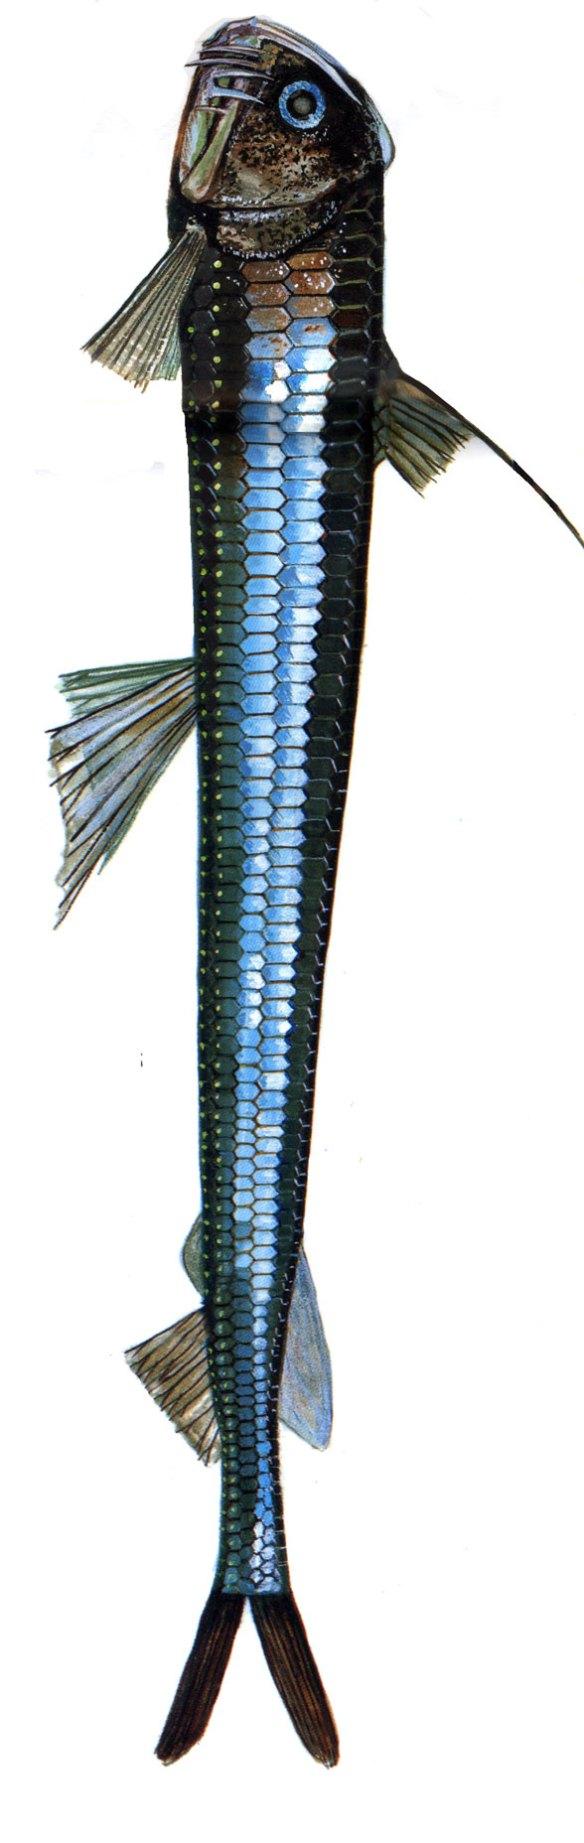 Figure 3. Chauliodus, the viperfish, in vivo.